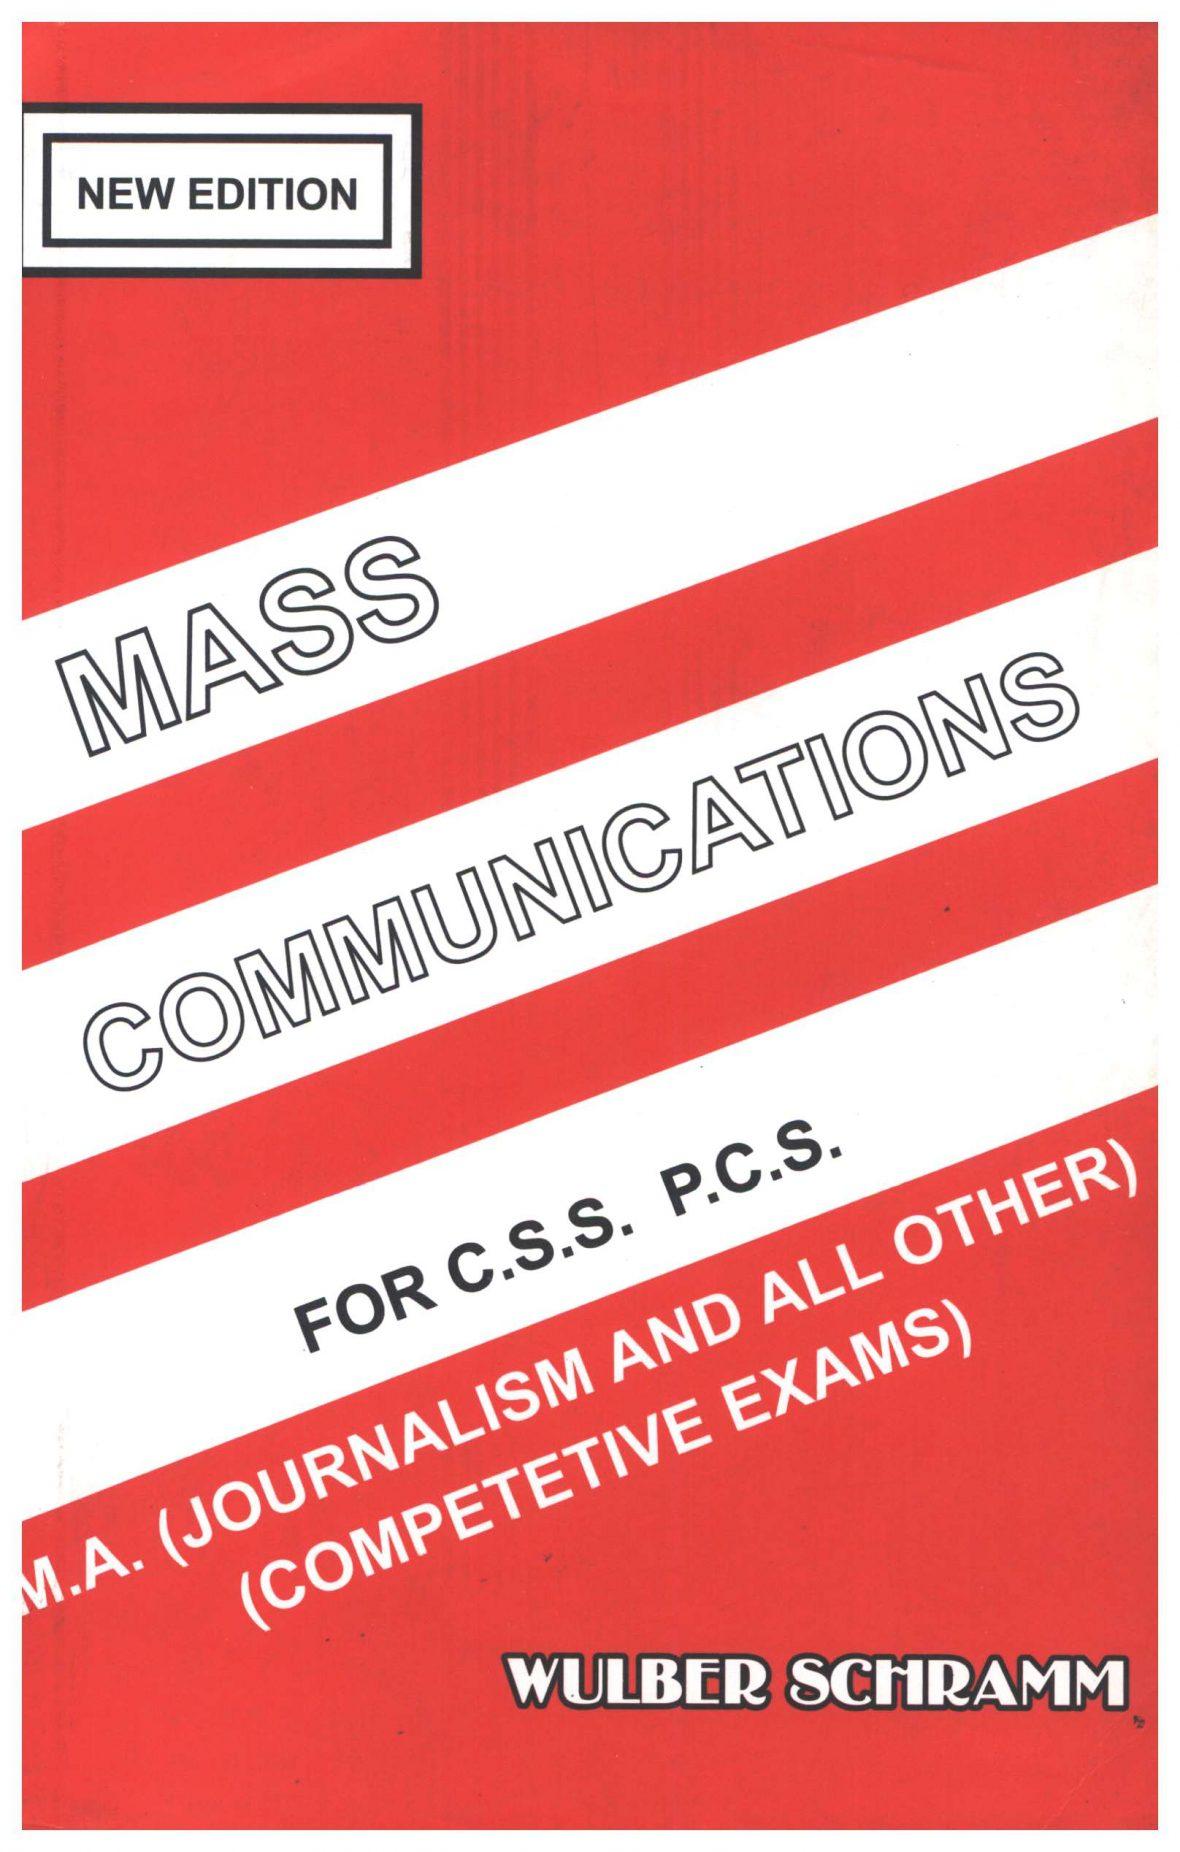 Mass Communications by Wilbur Schramm Download